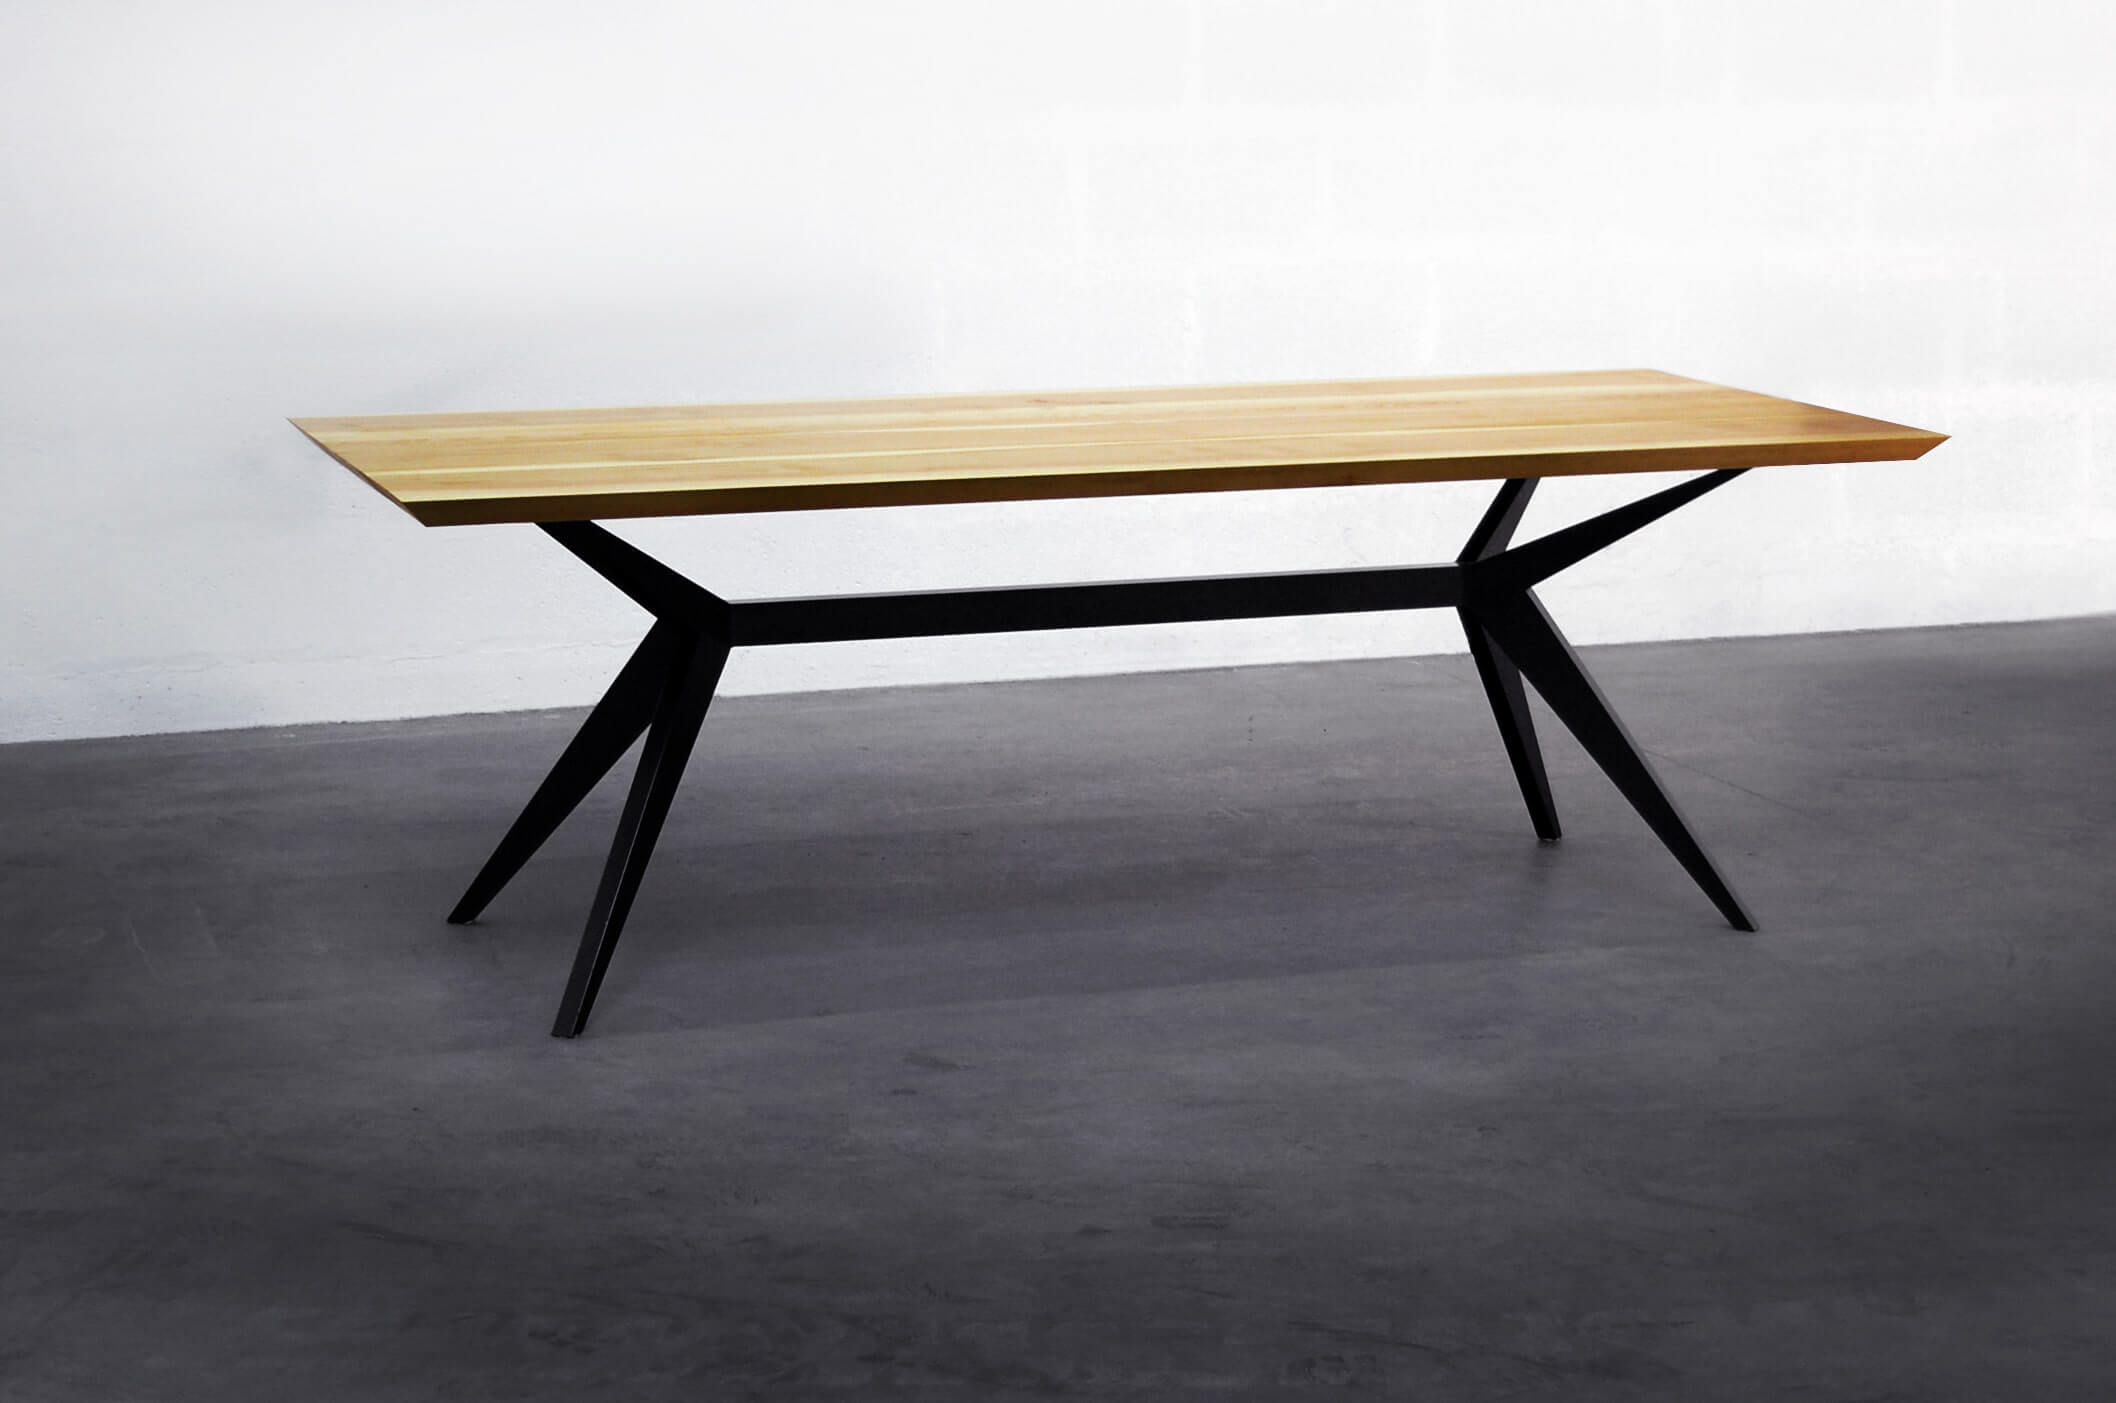 ARTMETA table Papillon 220 x 90 cm / Bois de Frêne olivier